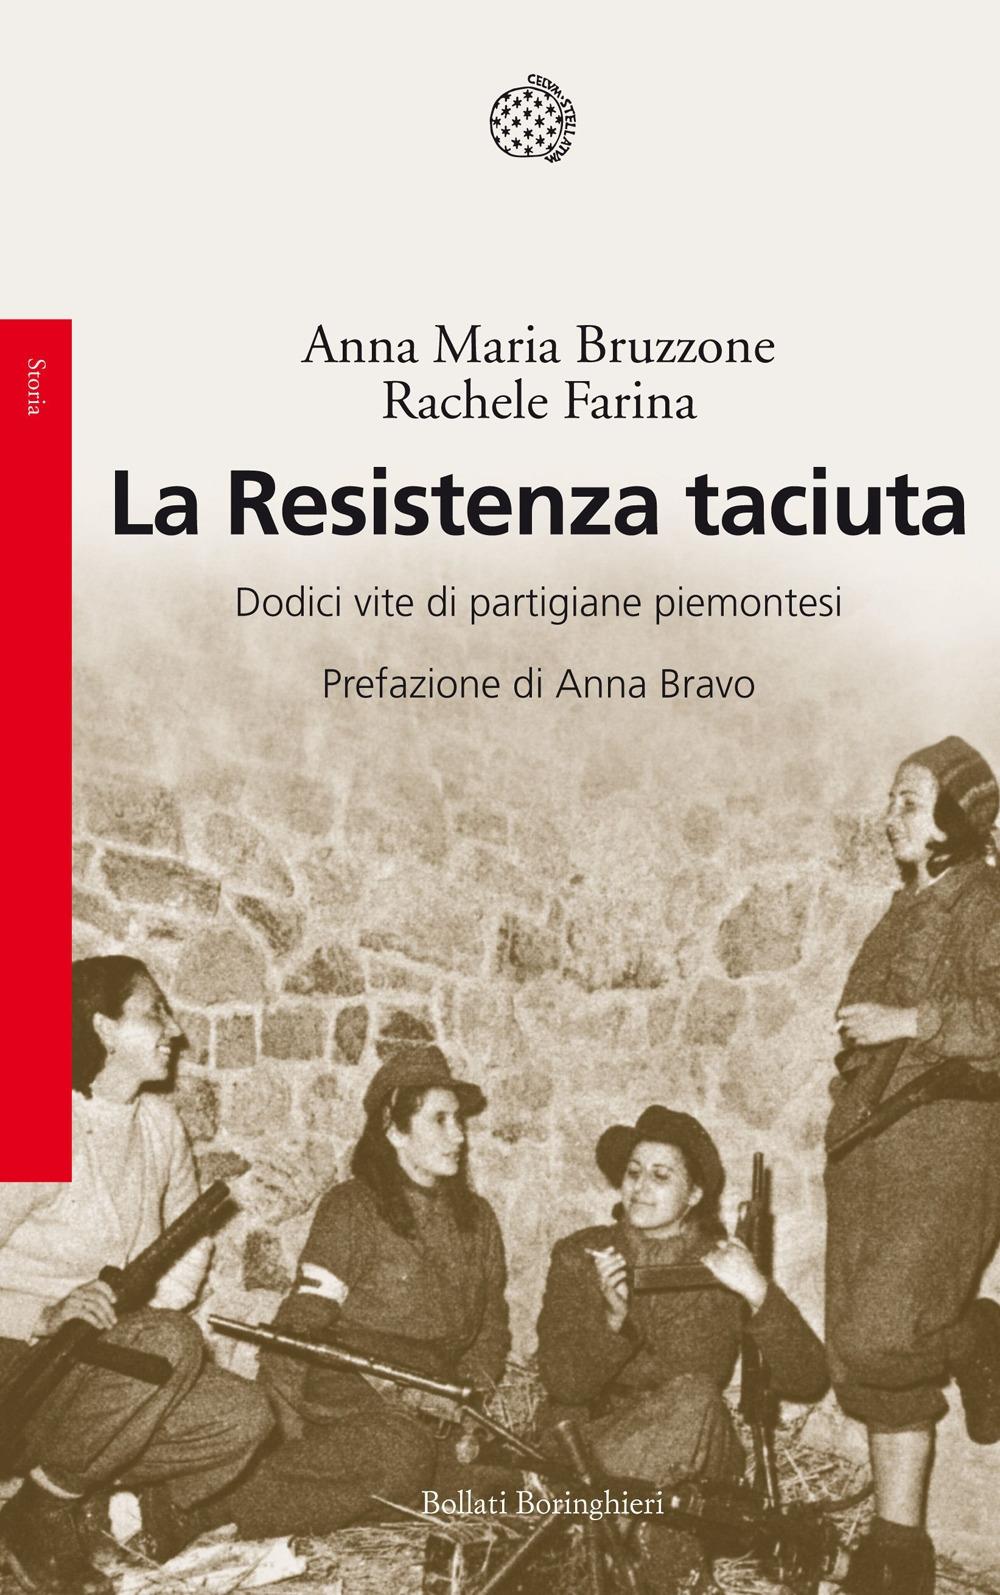 La Resistenza taciuta. Dodici vite di partigiane piemontesi.